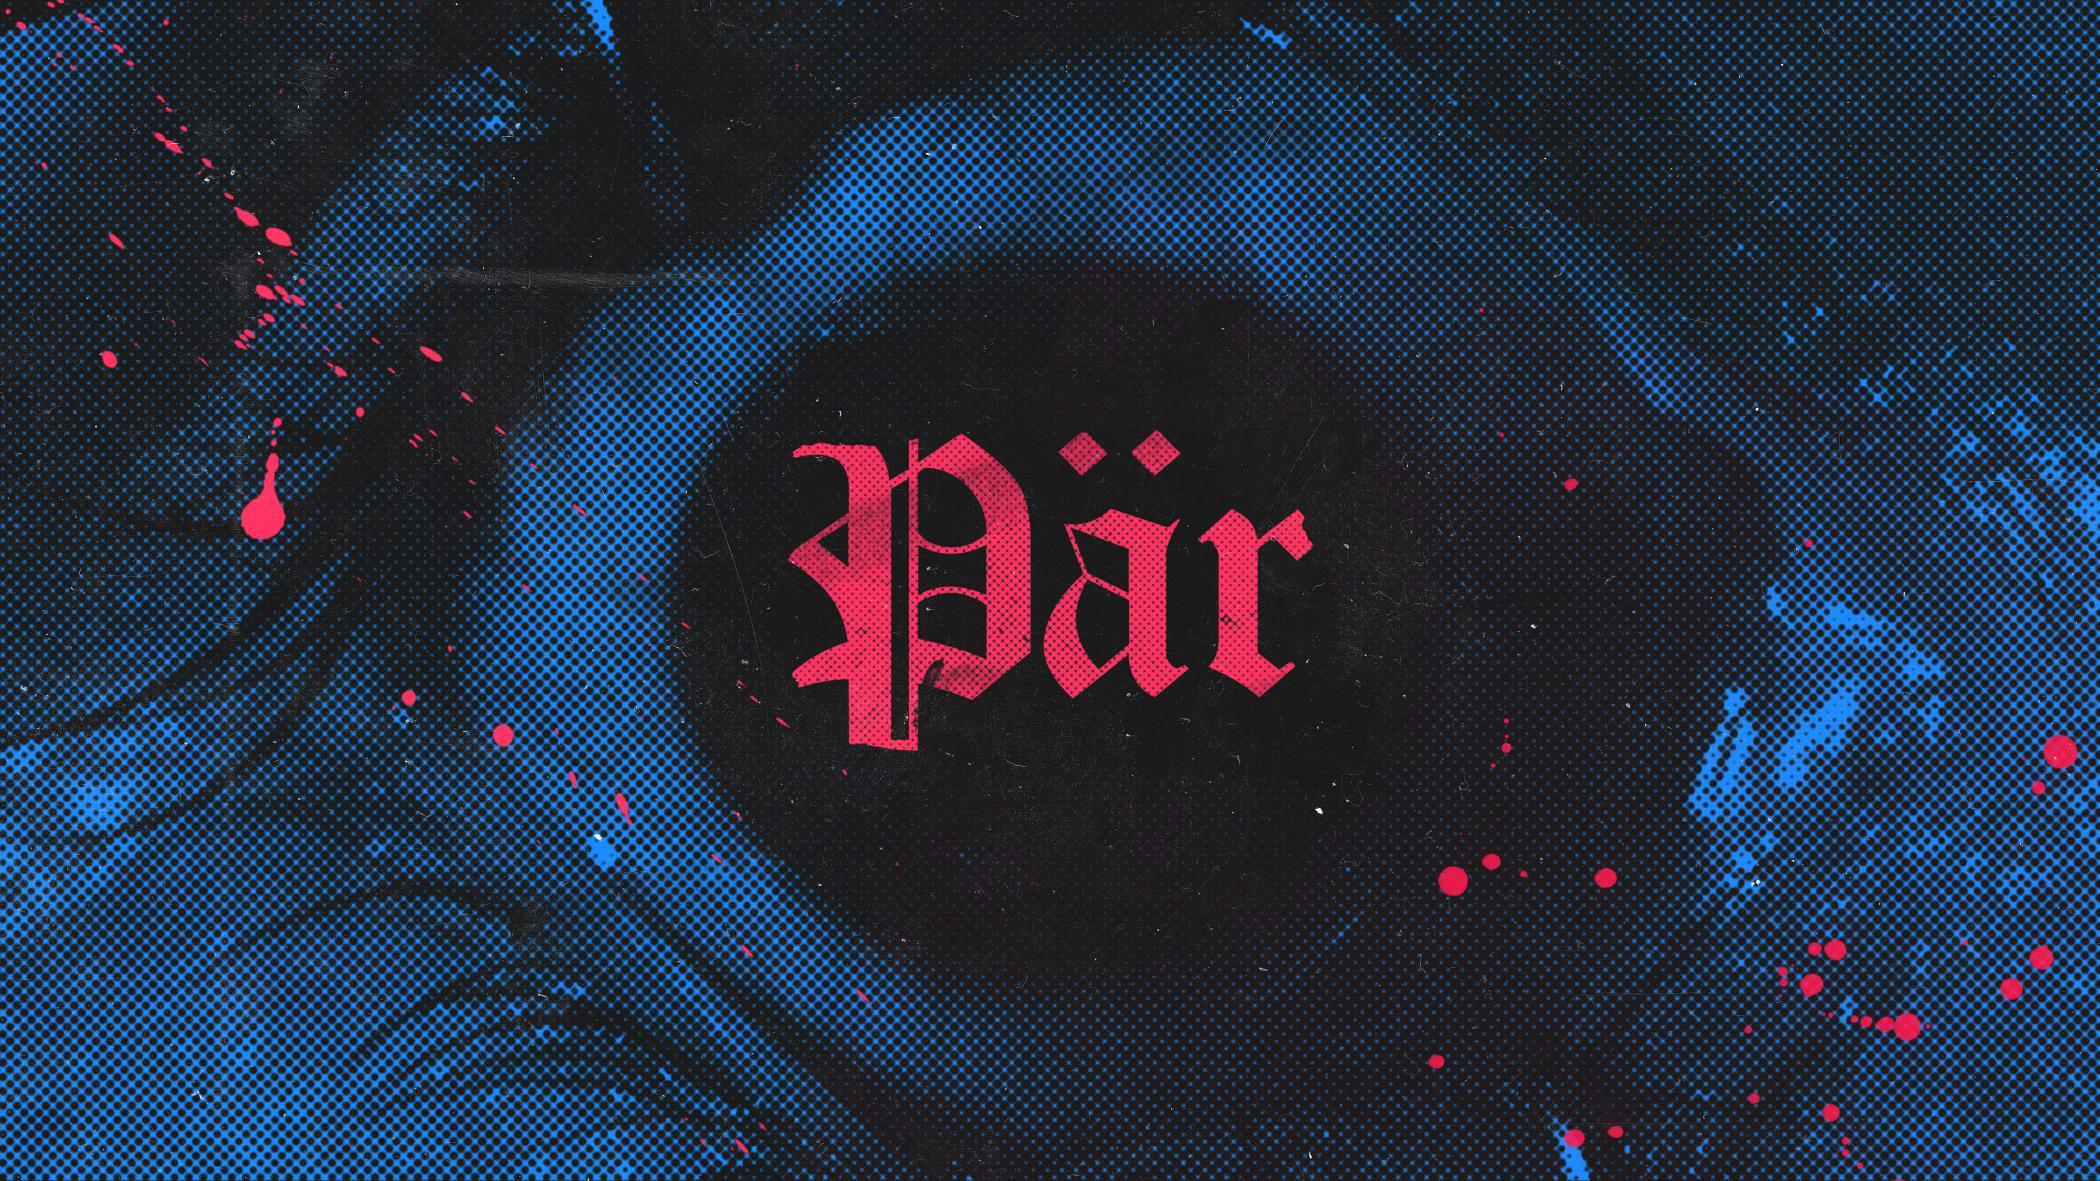 Polar_J_Styleframe_02.jpg